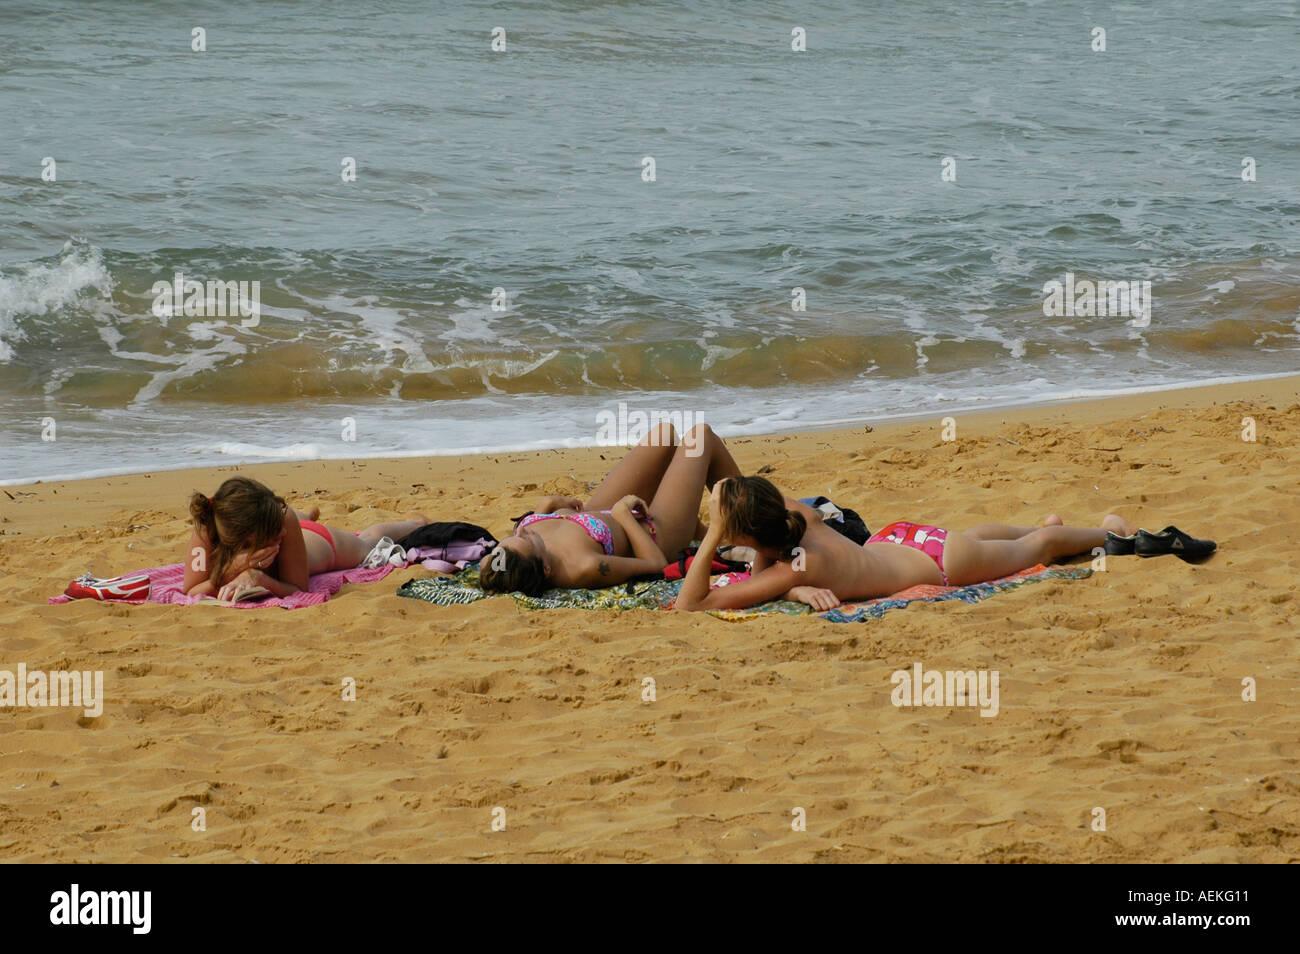 Women sunbathing in Golden Bay one of the few sand beaches on the north west coast of Pierce Newell near Għajn Tuffiena Stock Photo